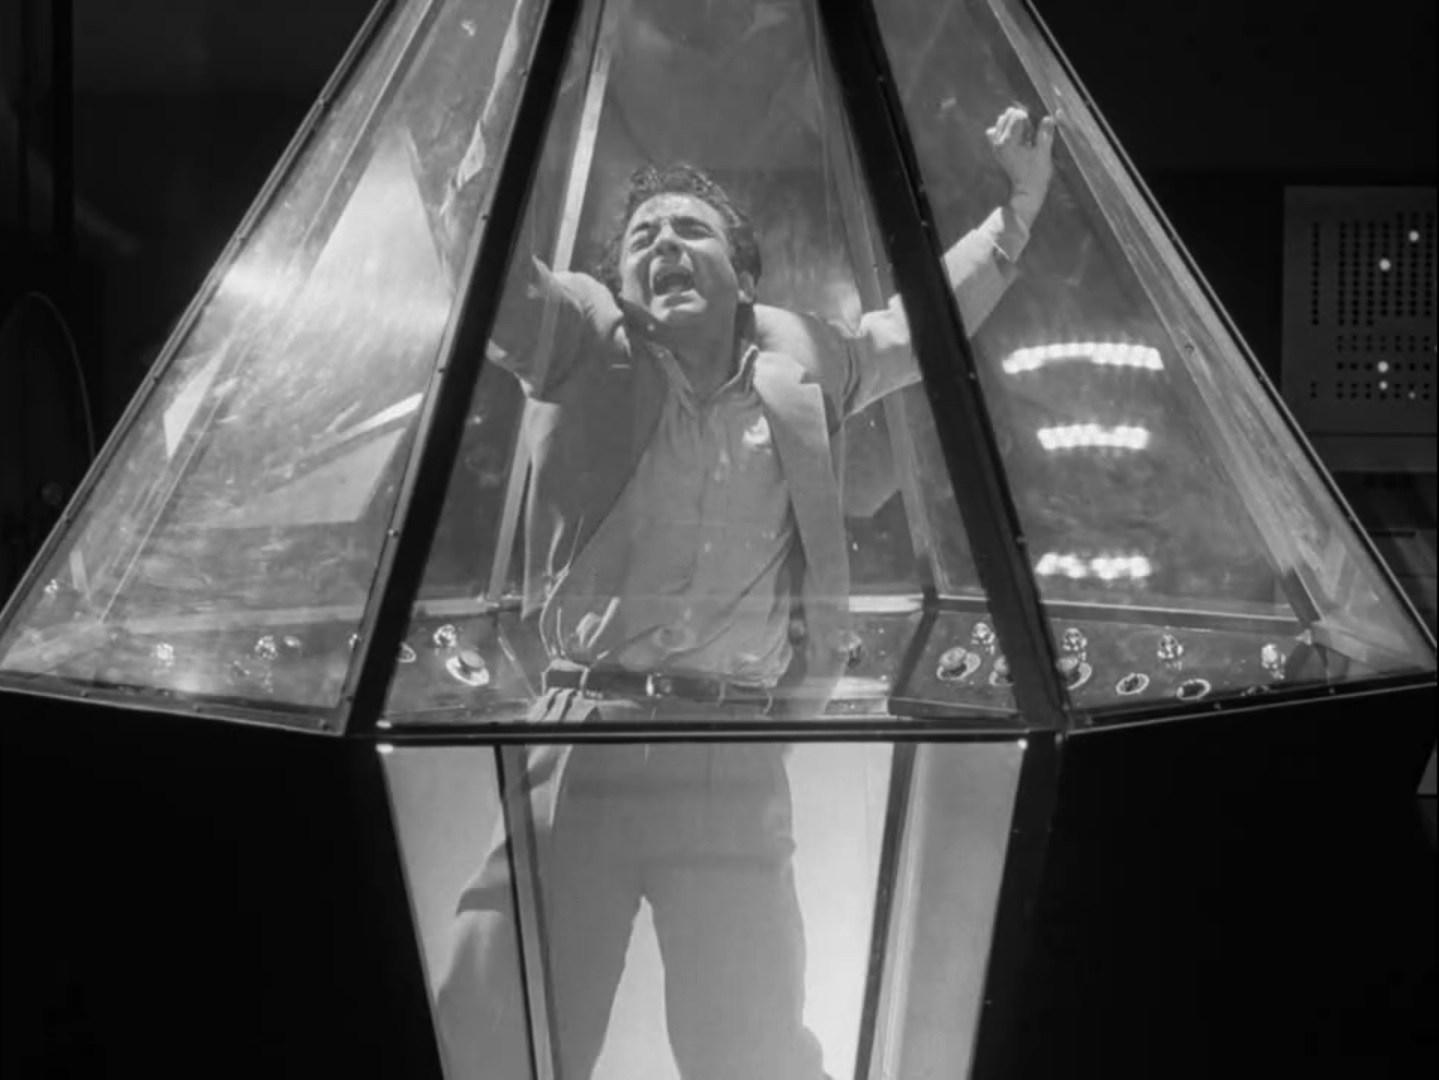 Paul Johnson (The Twilight Zone)